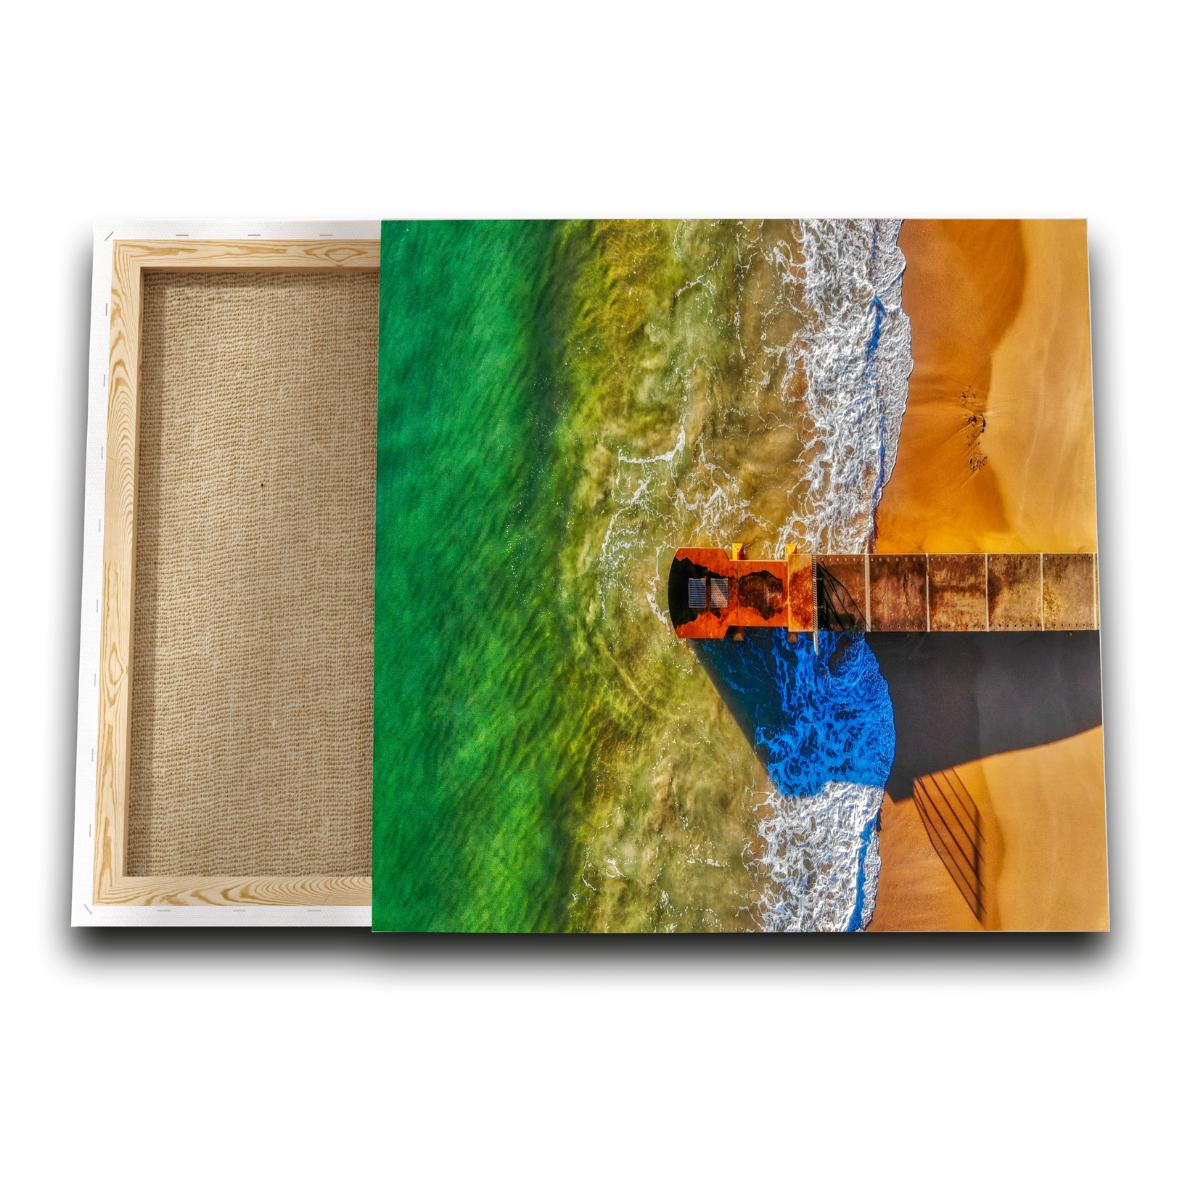 Canvas Prints   Personalised Photo Canvas Prints Online  InkPrint